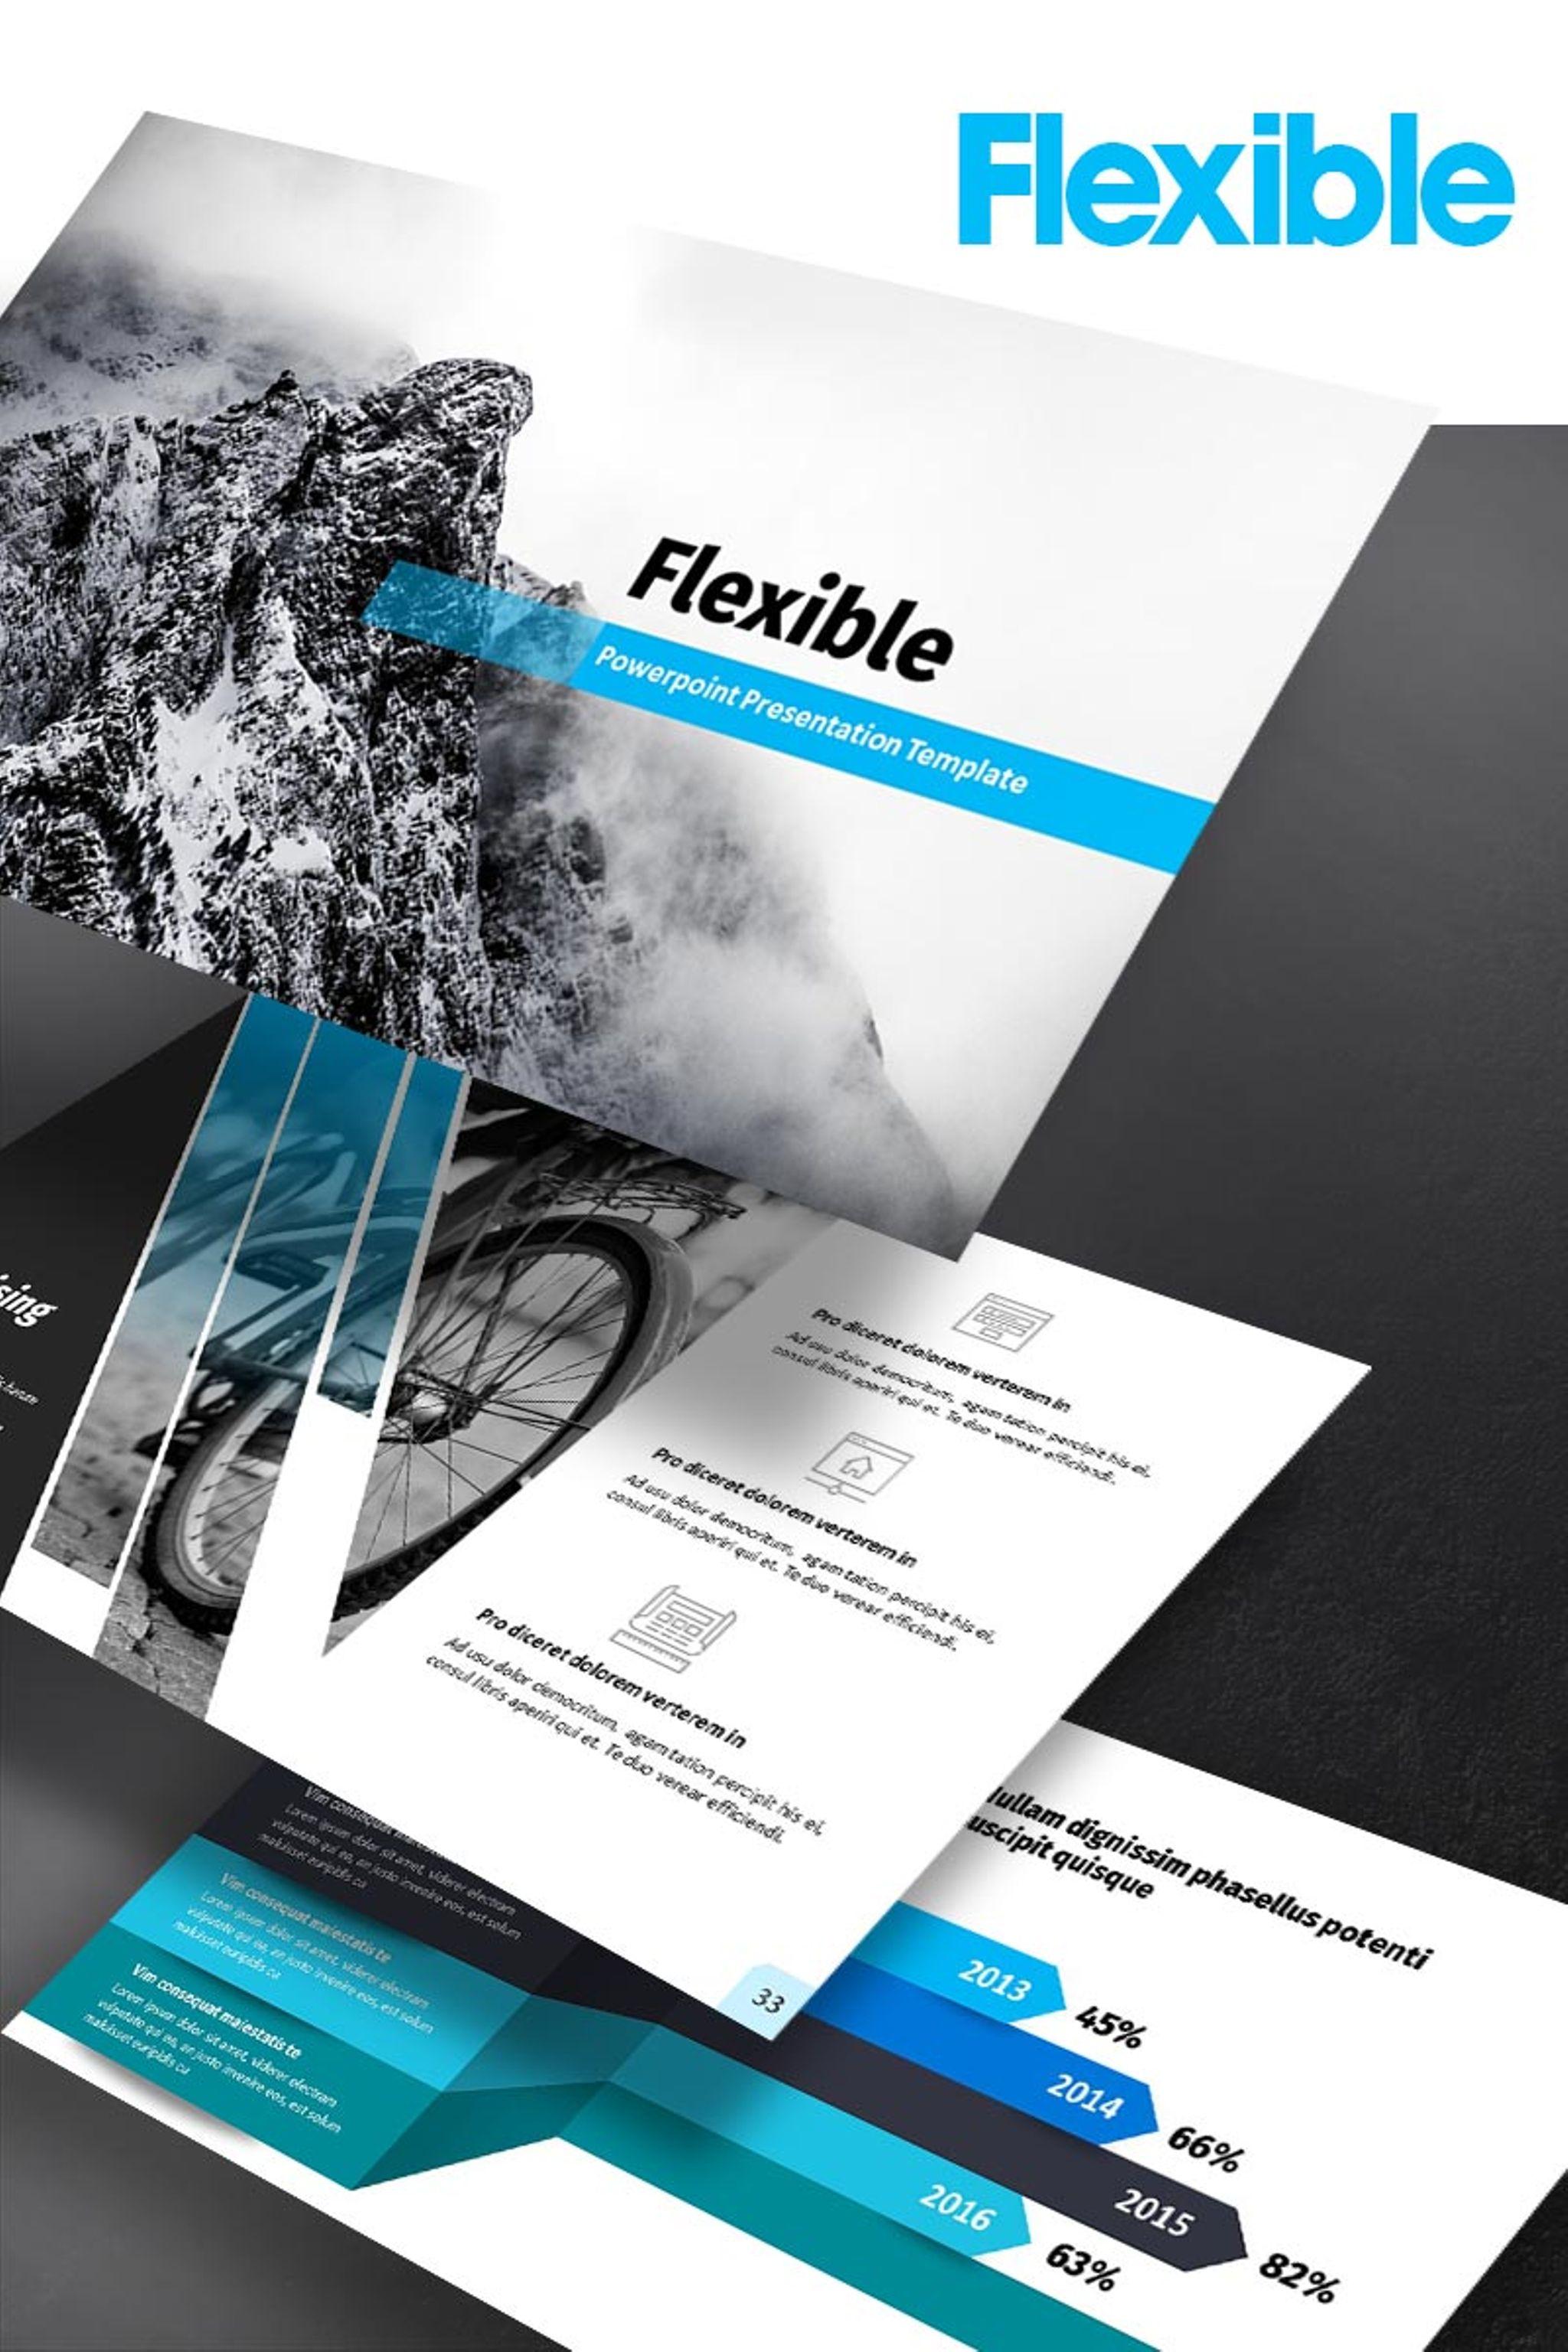 Szablon PowerPoint Flexible #65151